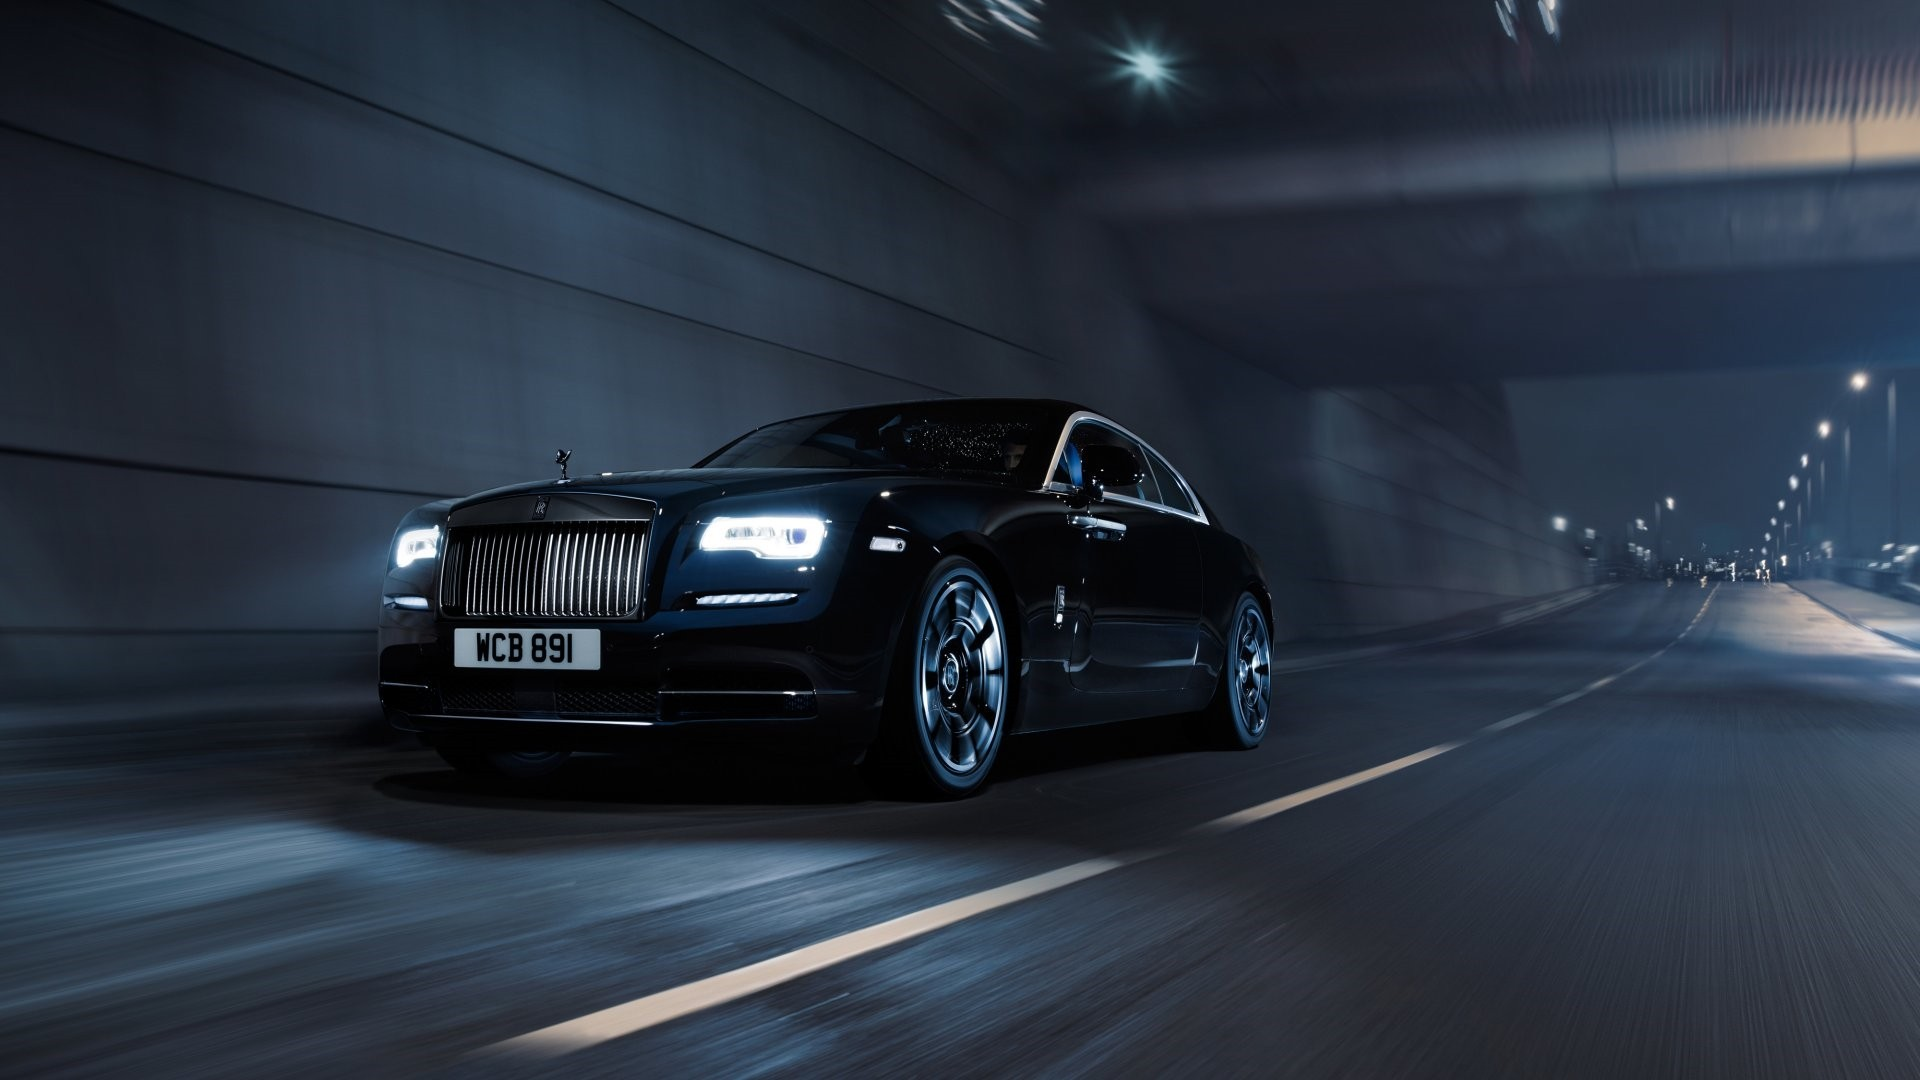 Rolls Royce Wraith HD Wallpaper